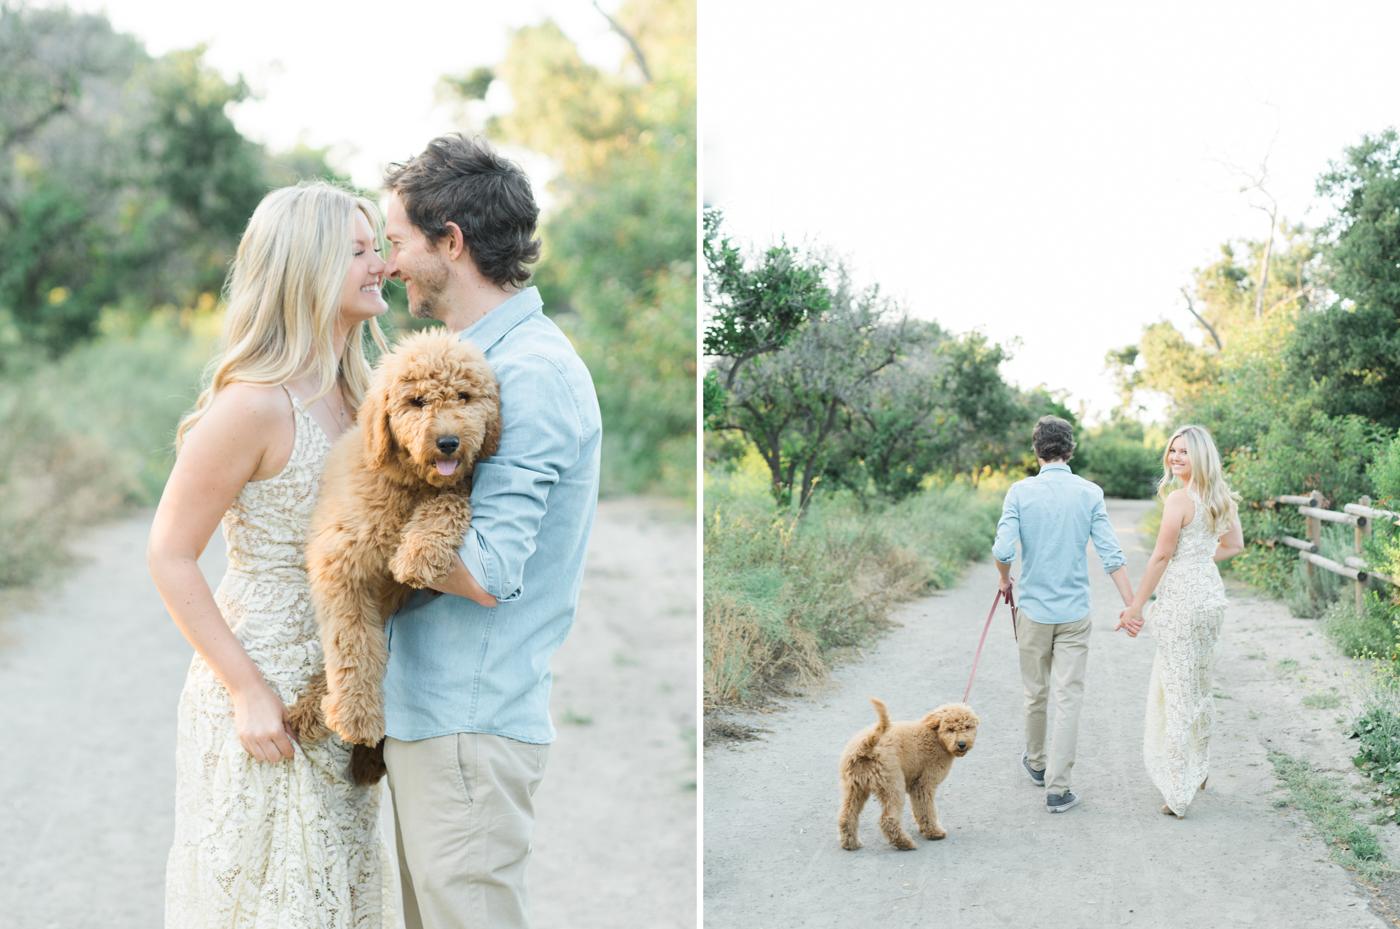 San_Juan_Capistrano_Goldendoodle_family_portrait_session_los_angeles_wedding_photographer-13.jpg